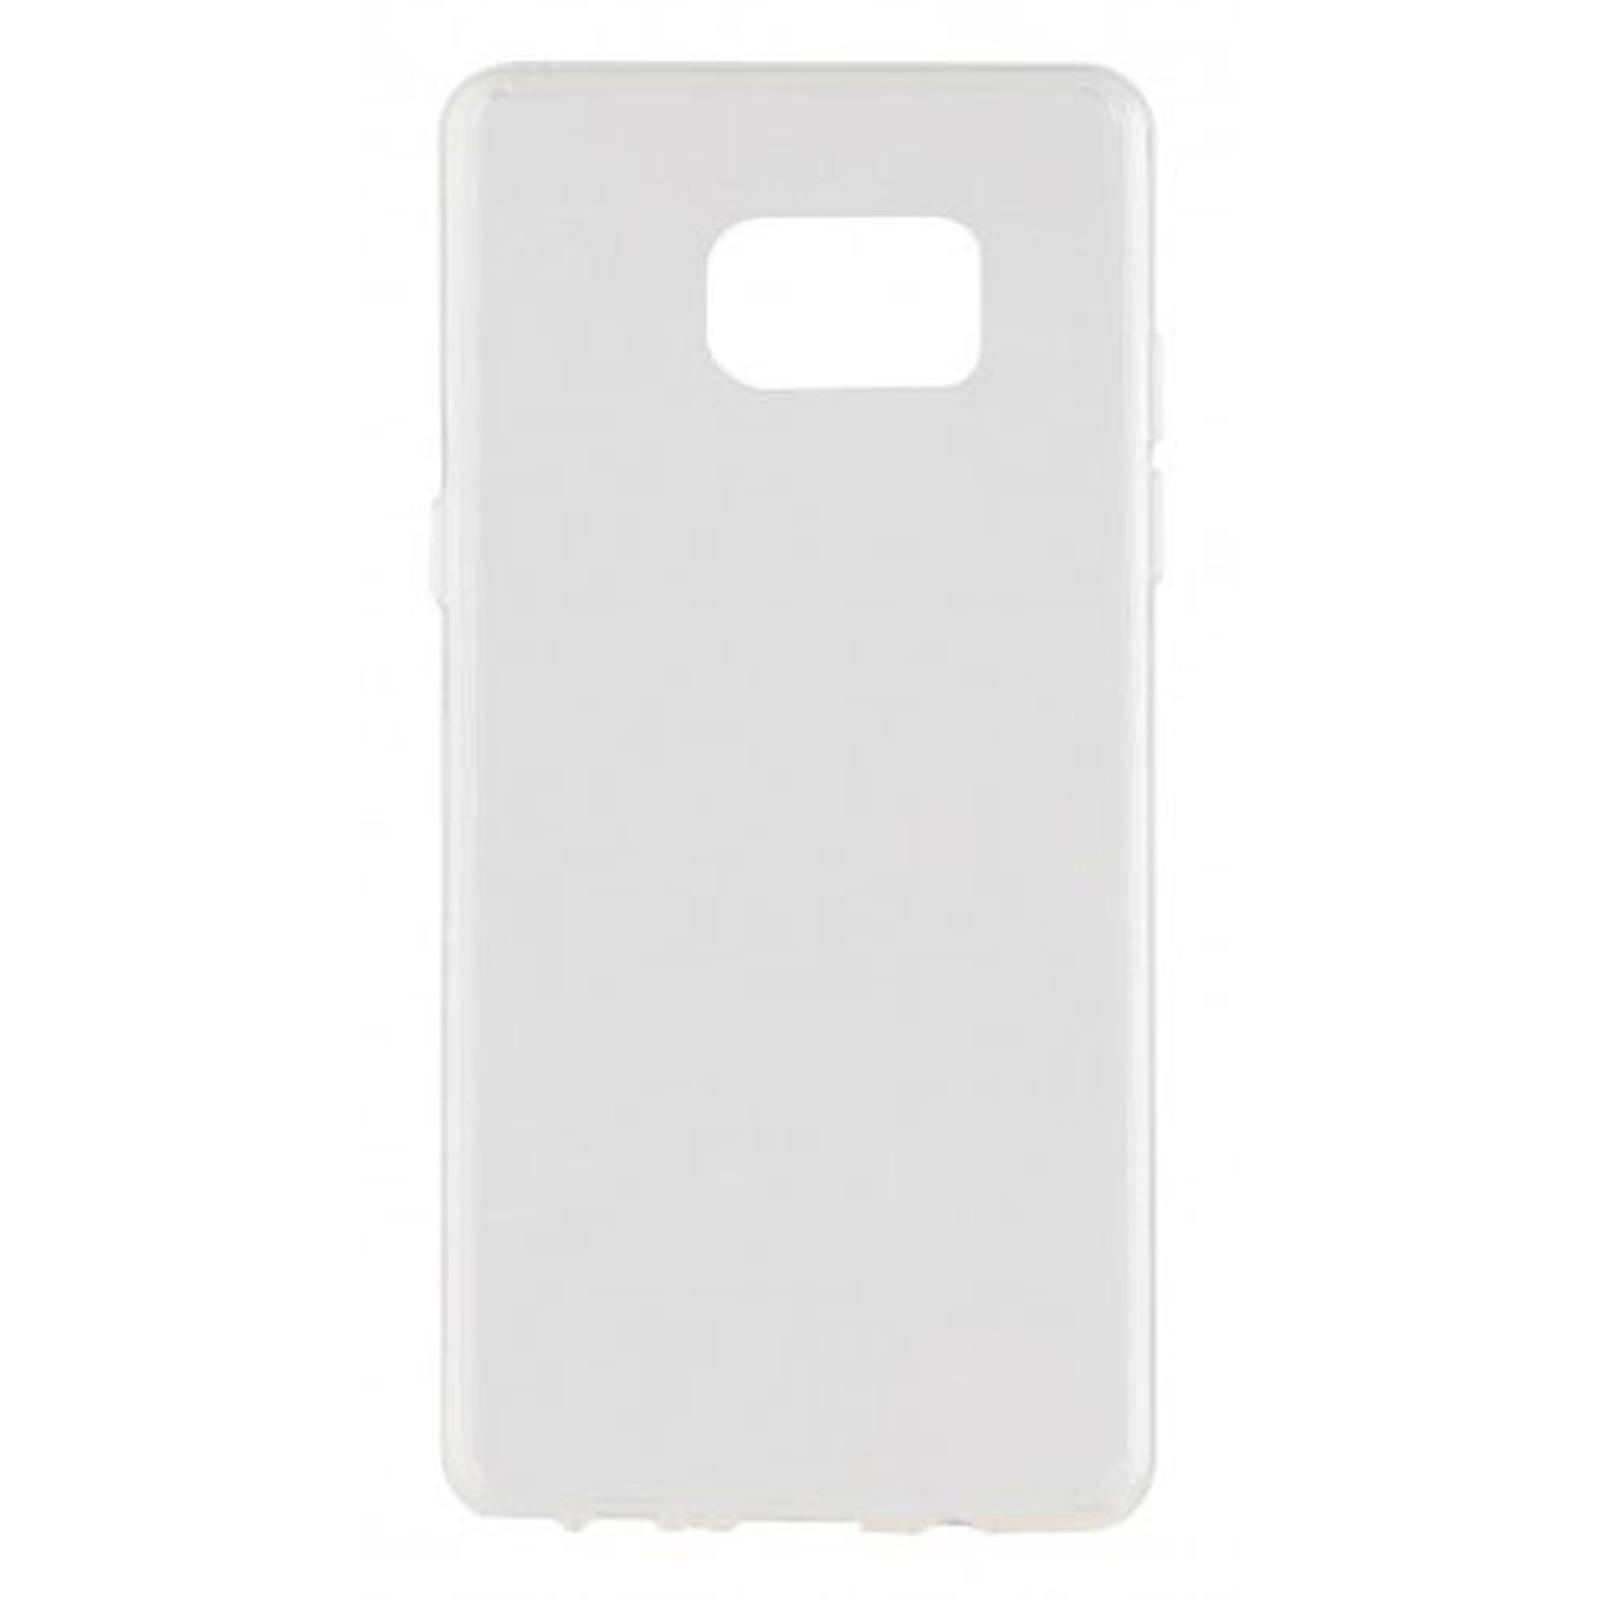 xqisit Coque iPlate Glossy Samsung Galaxy Note7